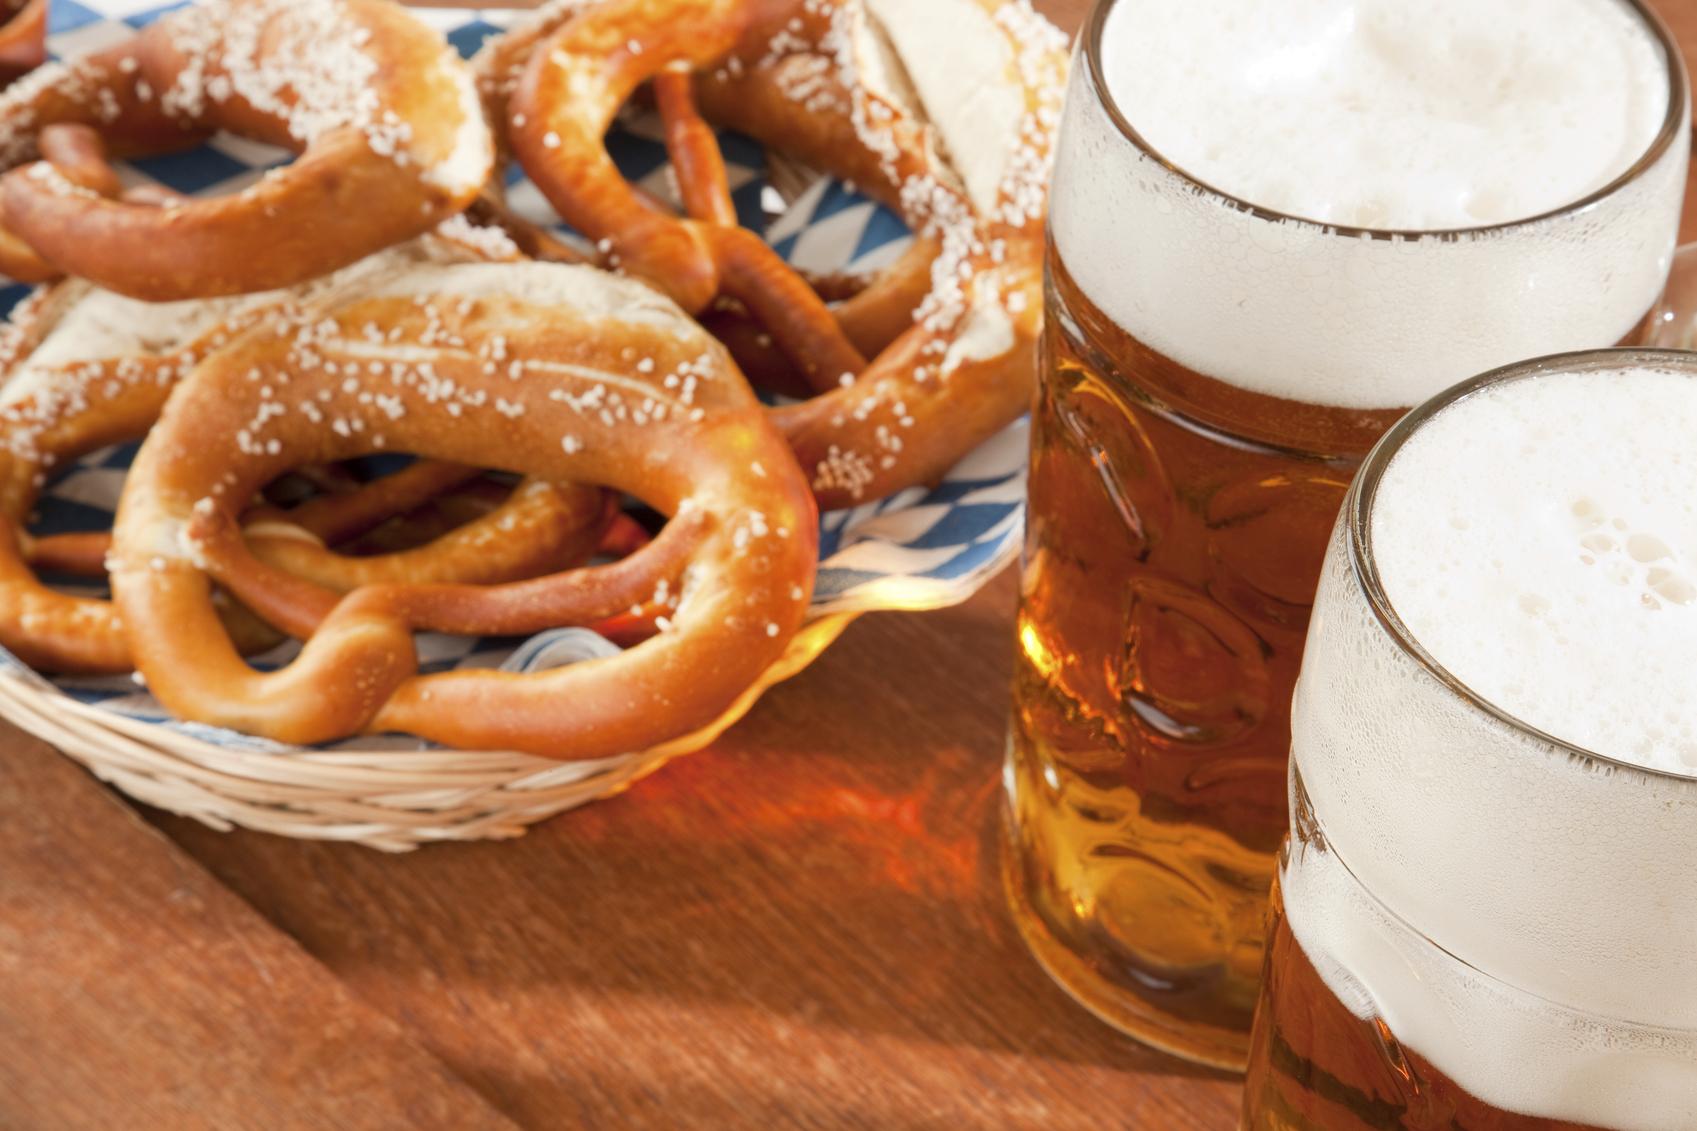 Oktoberfest Beer Mug and pretzel